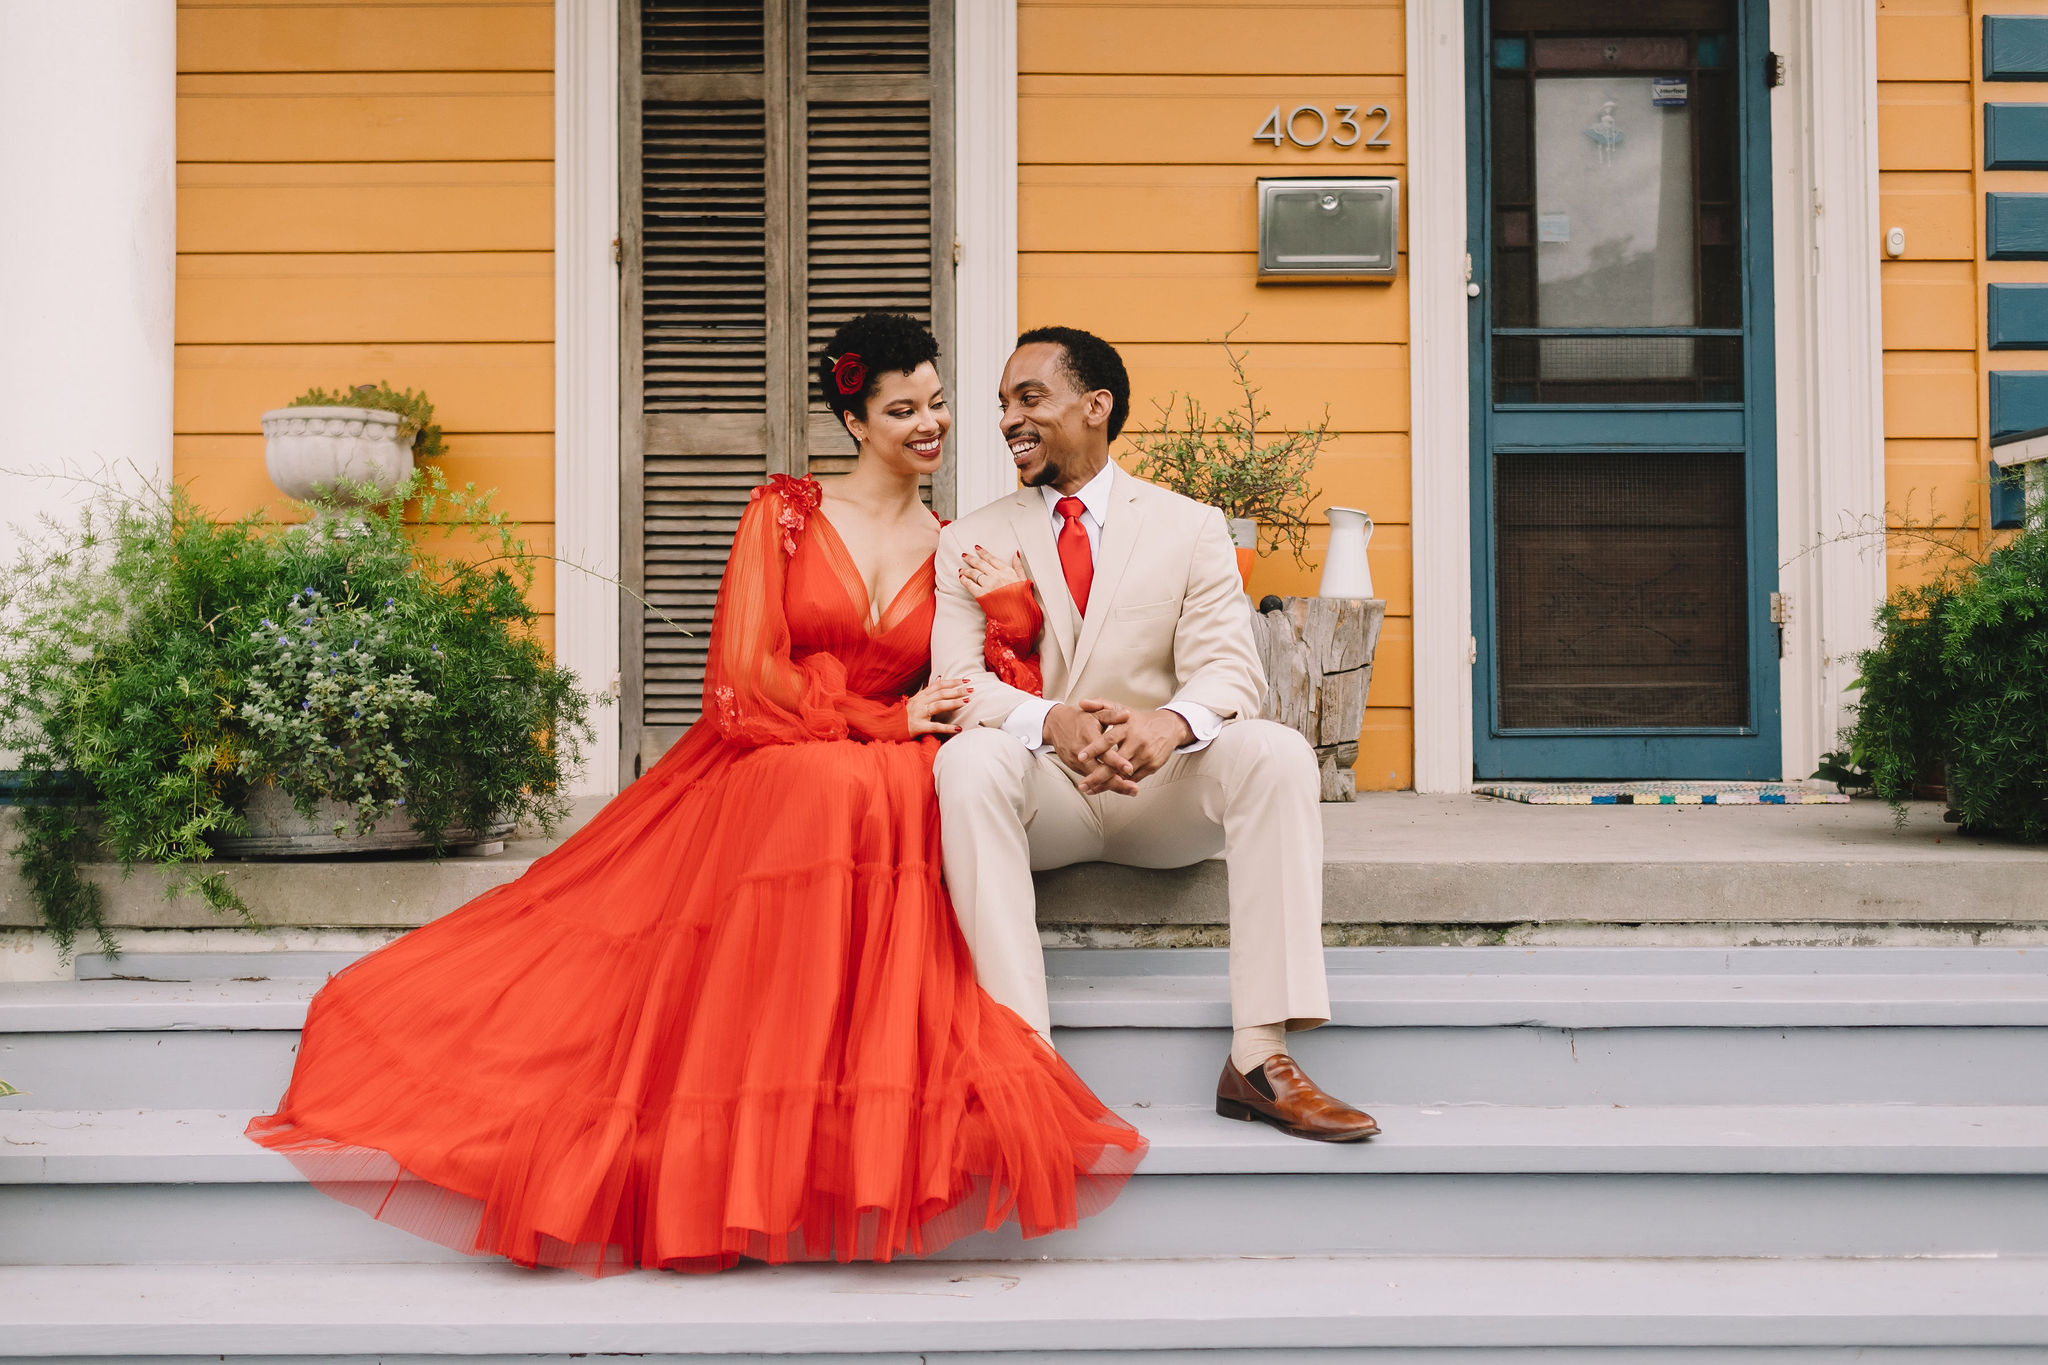 REAL WEDDING:: MOROLAKE ODELEYE + WILL COBBS IV